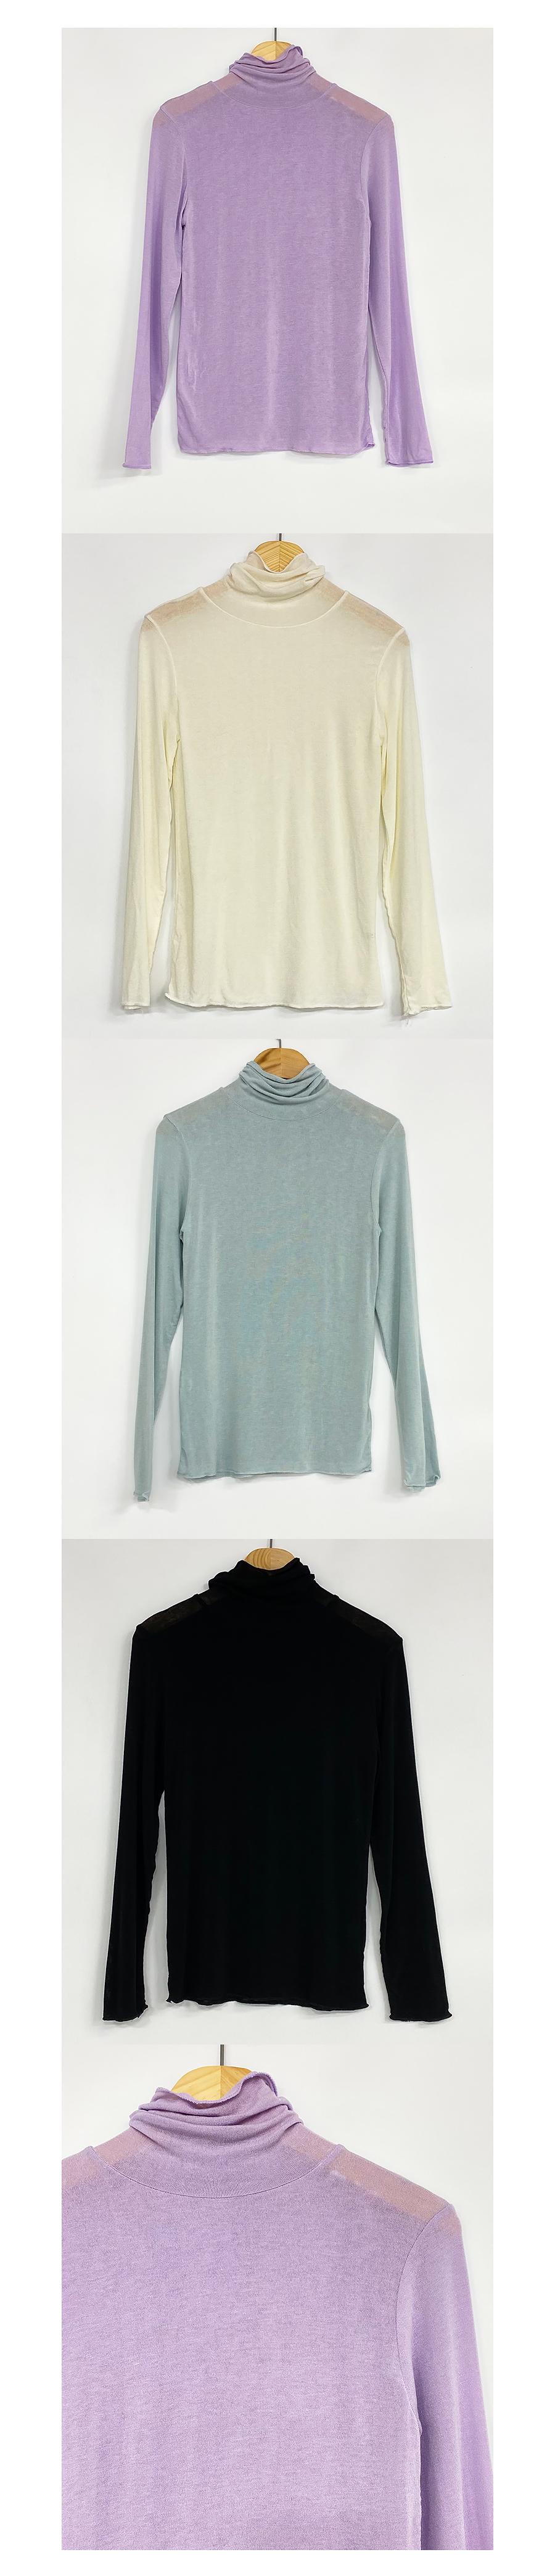 Mate Turtleneck T-shirt Spandex Daily 4color